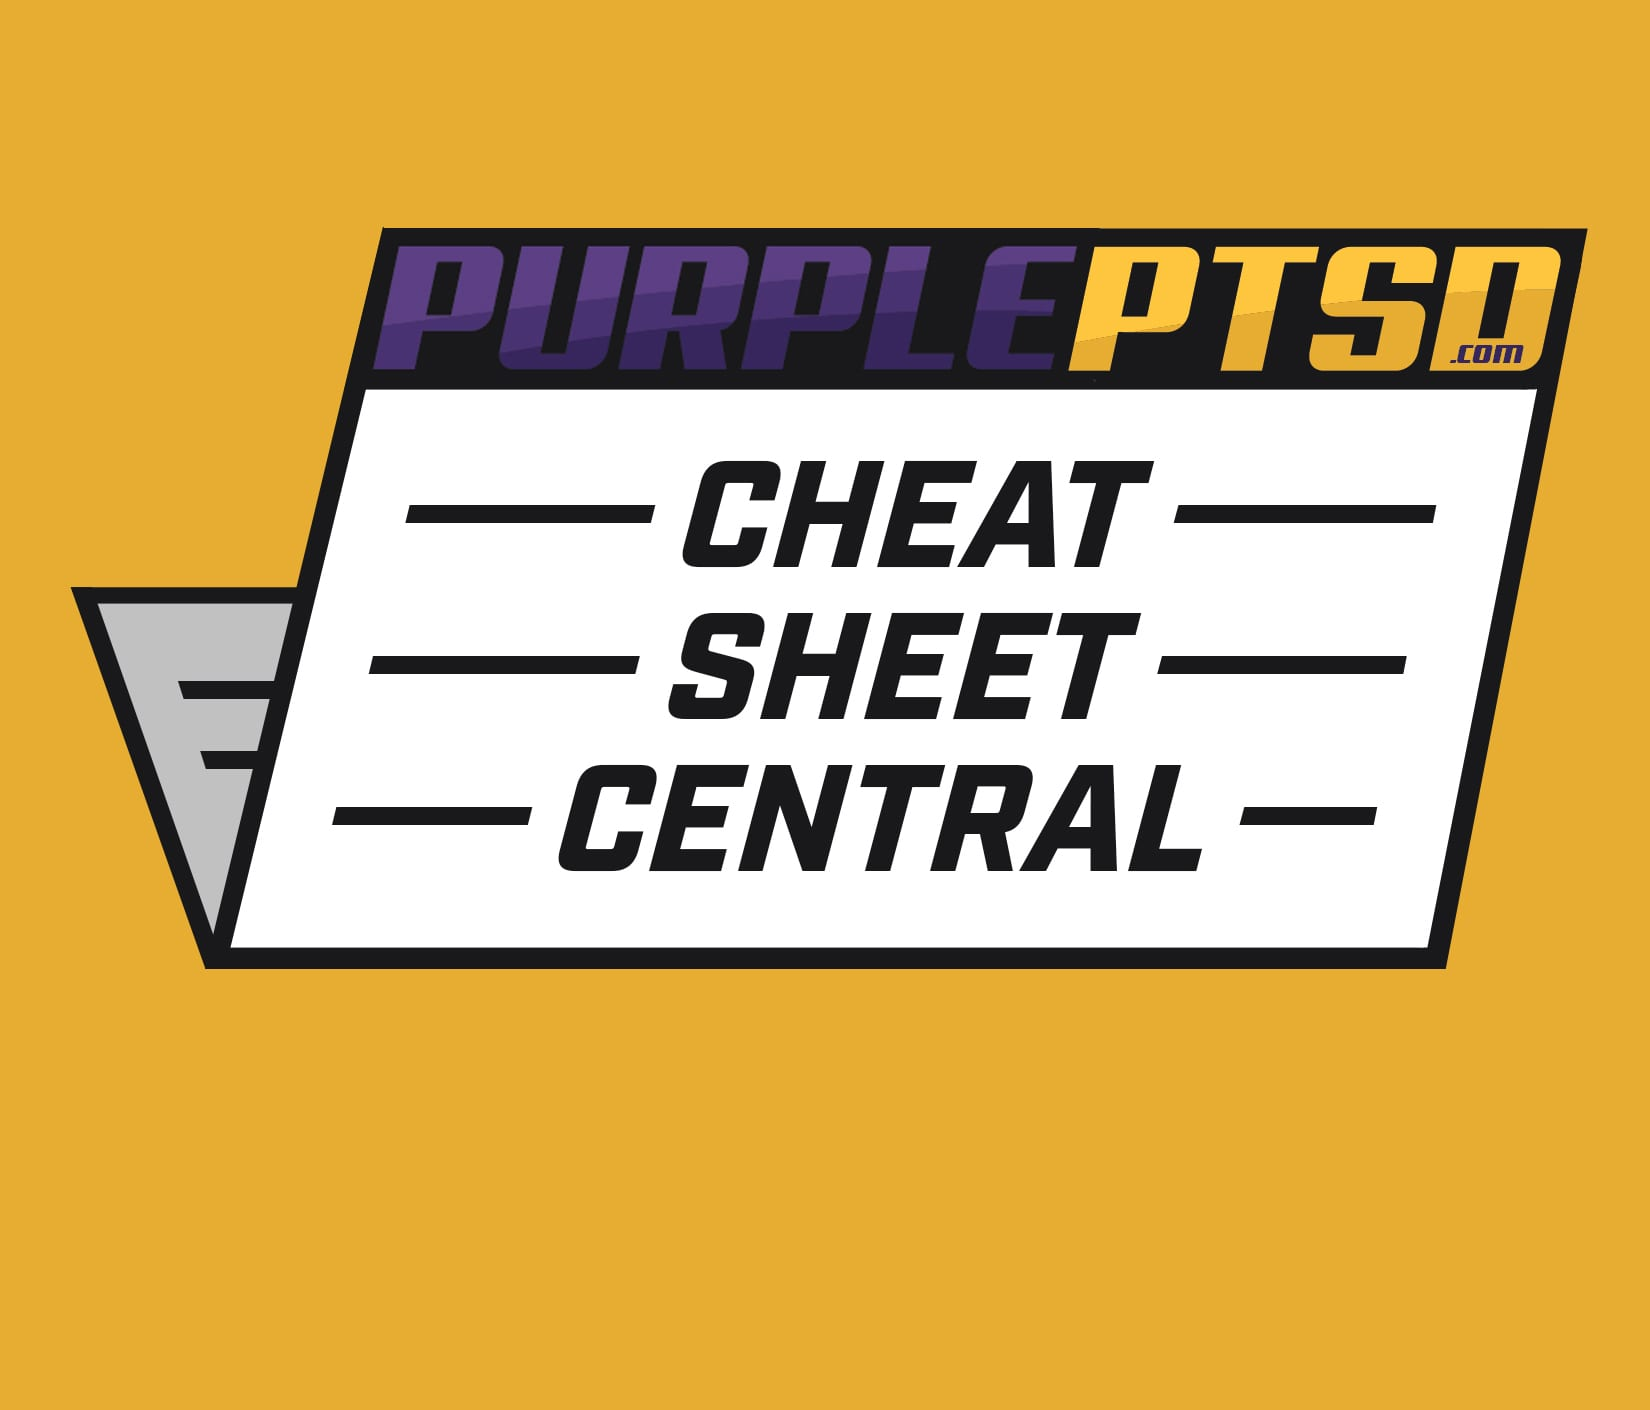 Purpleptsd s fantasy football cheat sheets